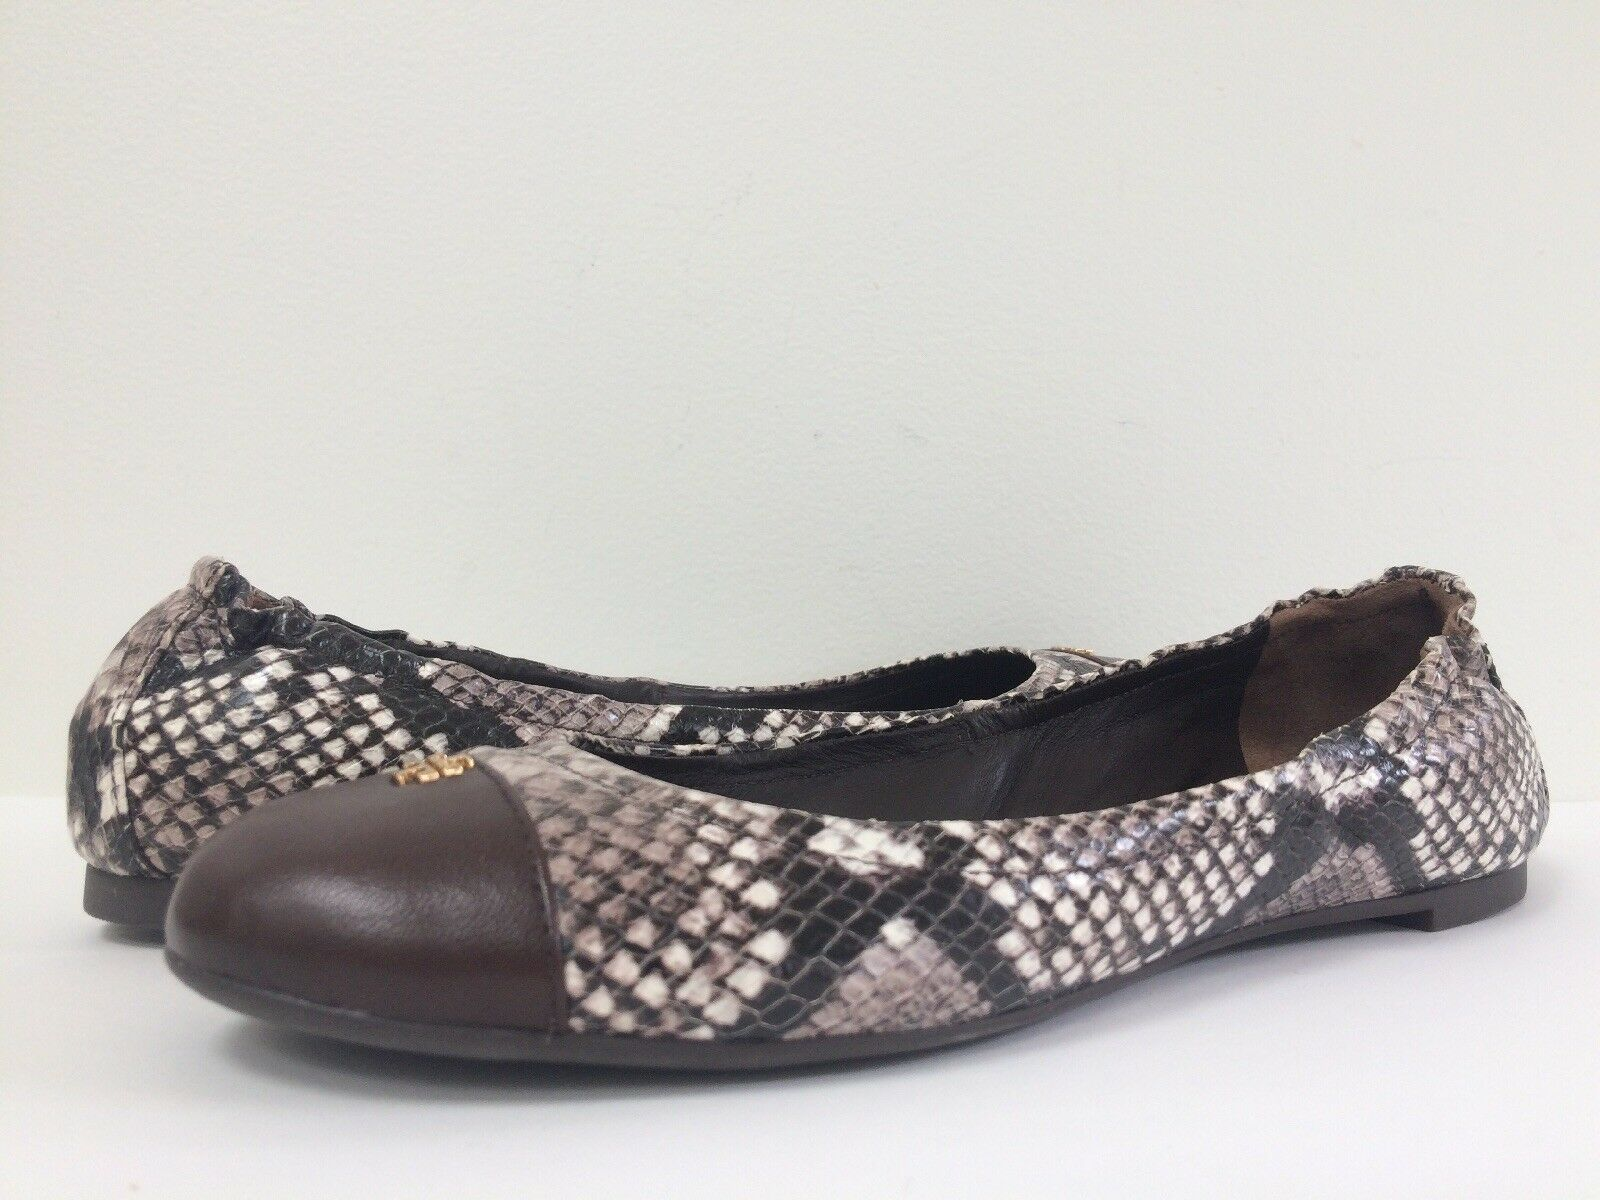 New Tory Burch 7.5M York Roccia Snake Print marron Multi Leather Ballet Flat 7.5M